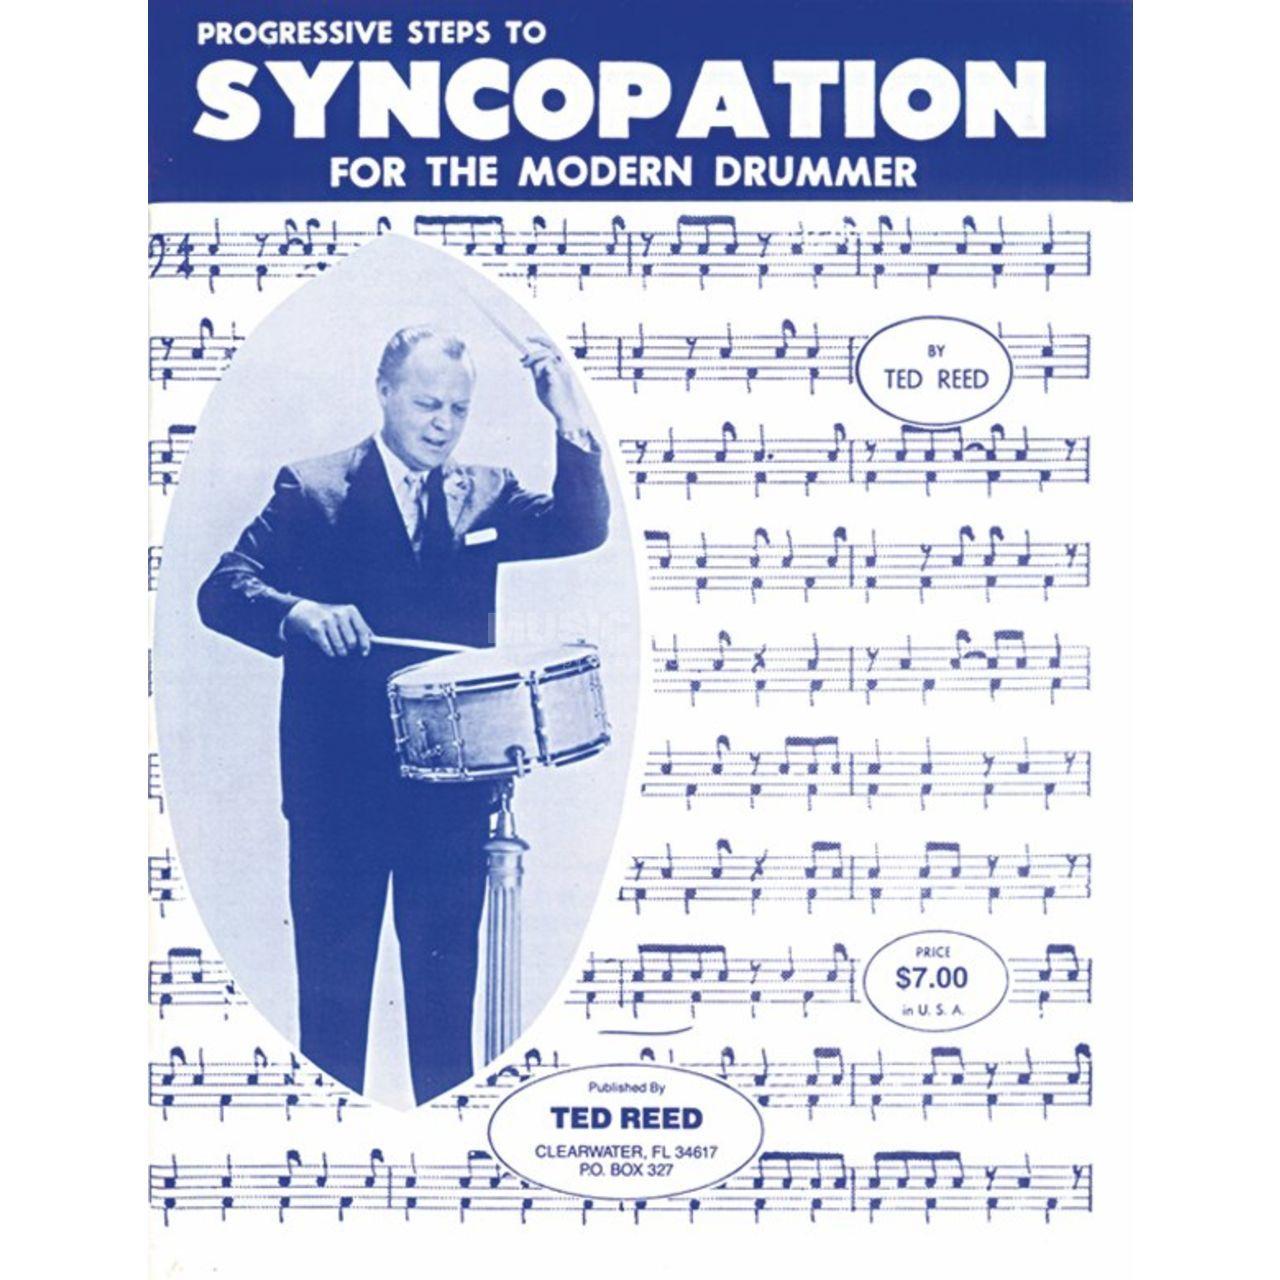 Progressive Steps to Syncopation